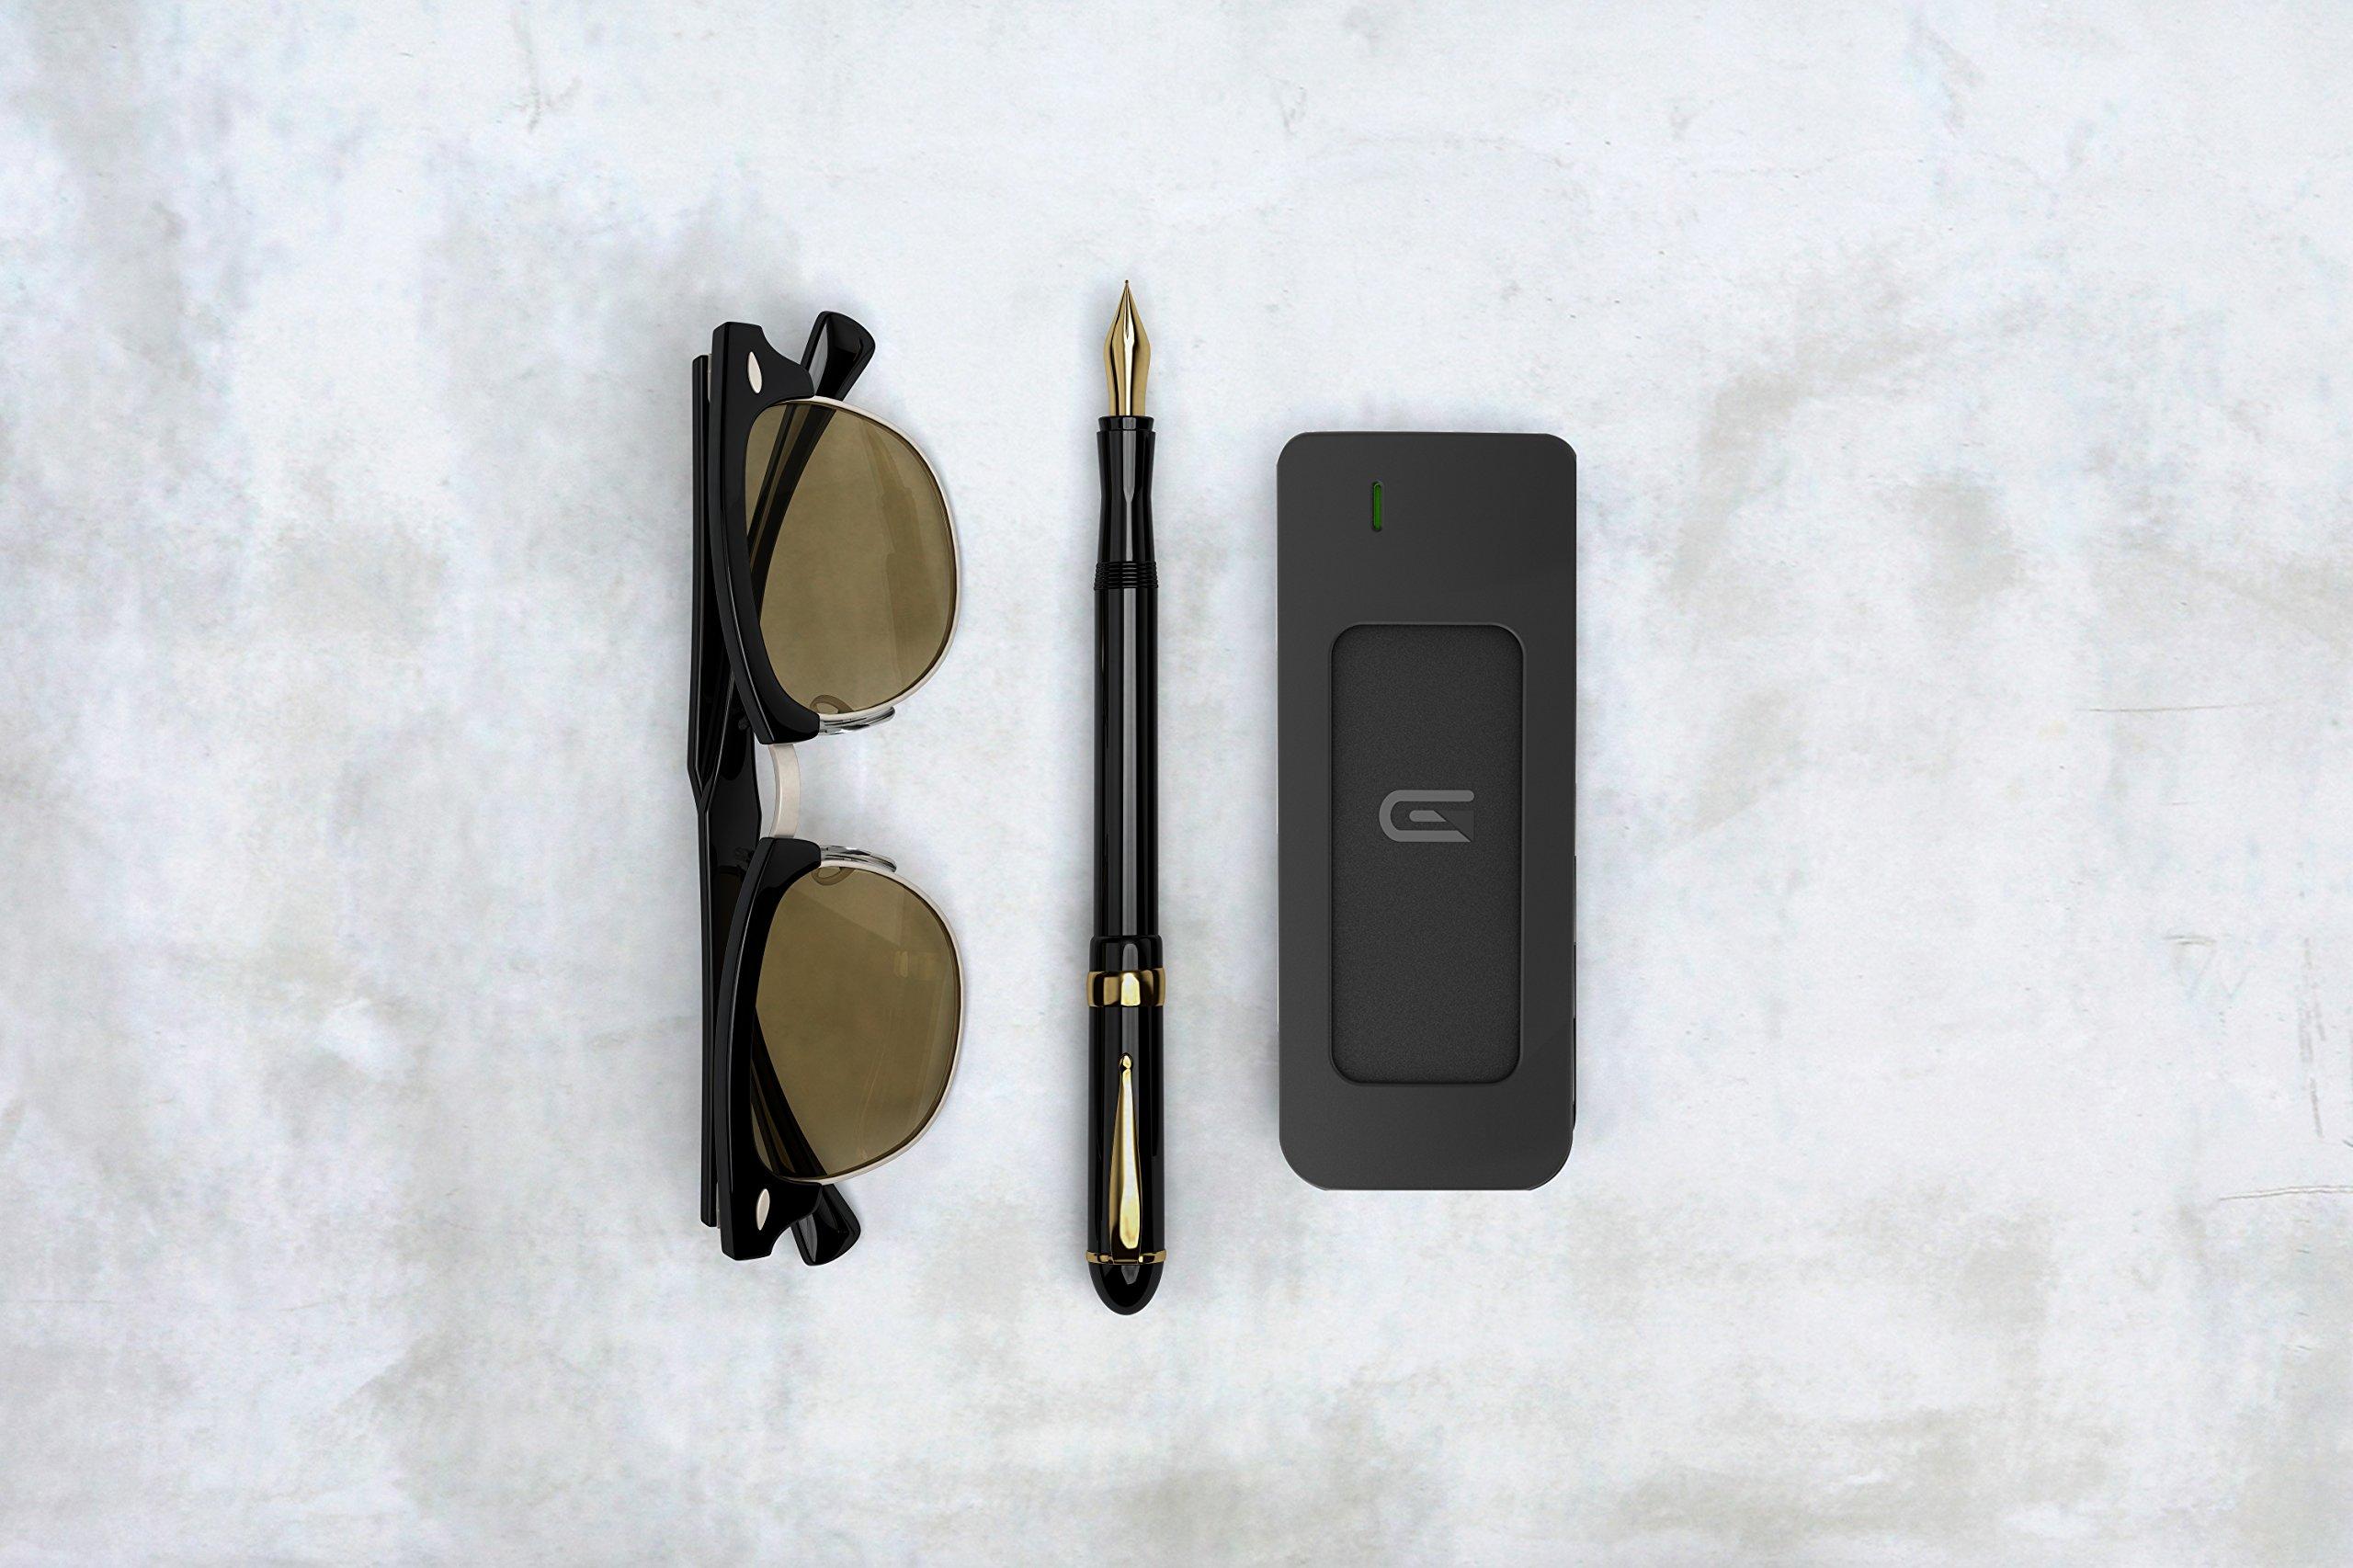 Glyph Atom SSD 2TB Black (External USB-C, USB 3.0, Thunderbolt 3) A2000BLK by Glyph Production Technologies (Image #6)